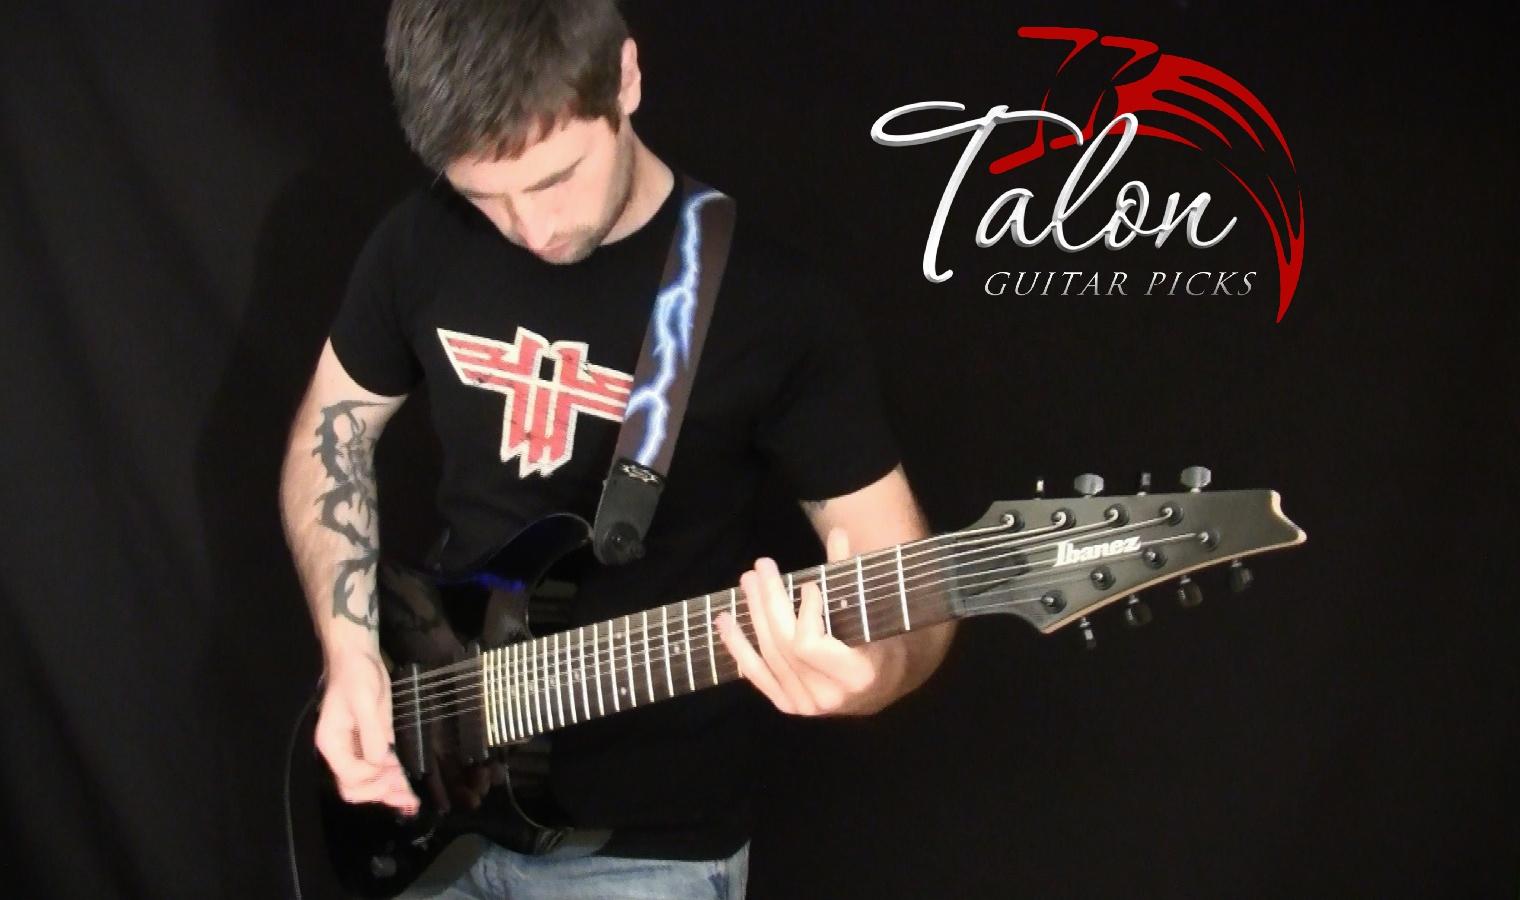 Best Guitar Pick Guitar Picks Online Guitar Picks For Sale